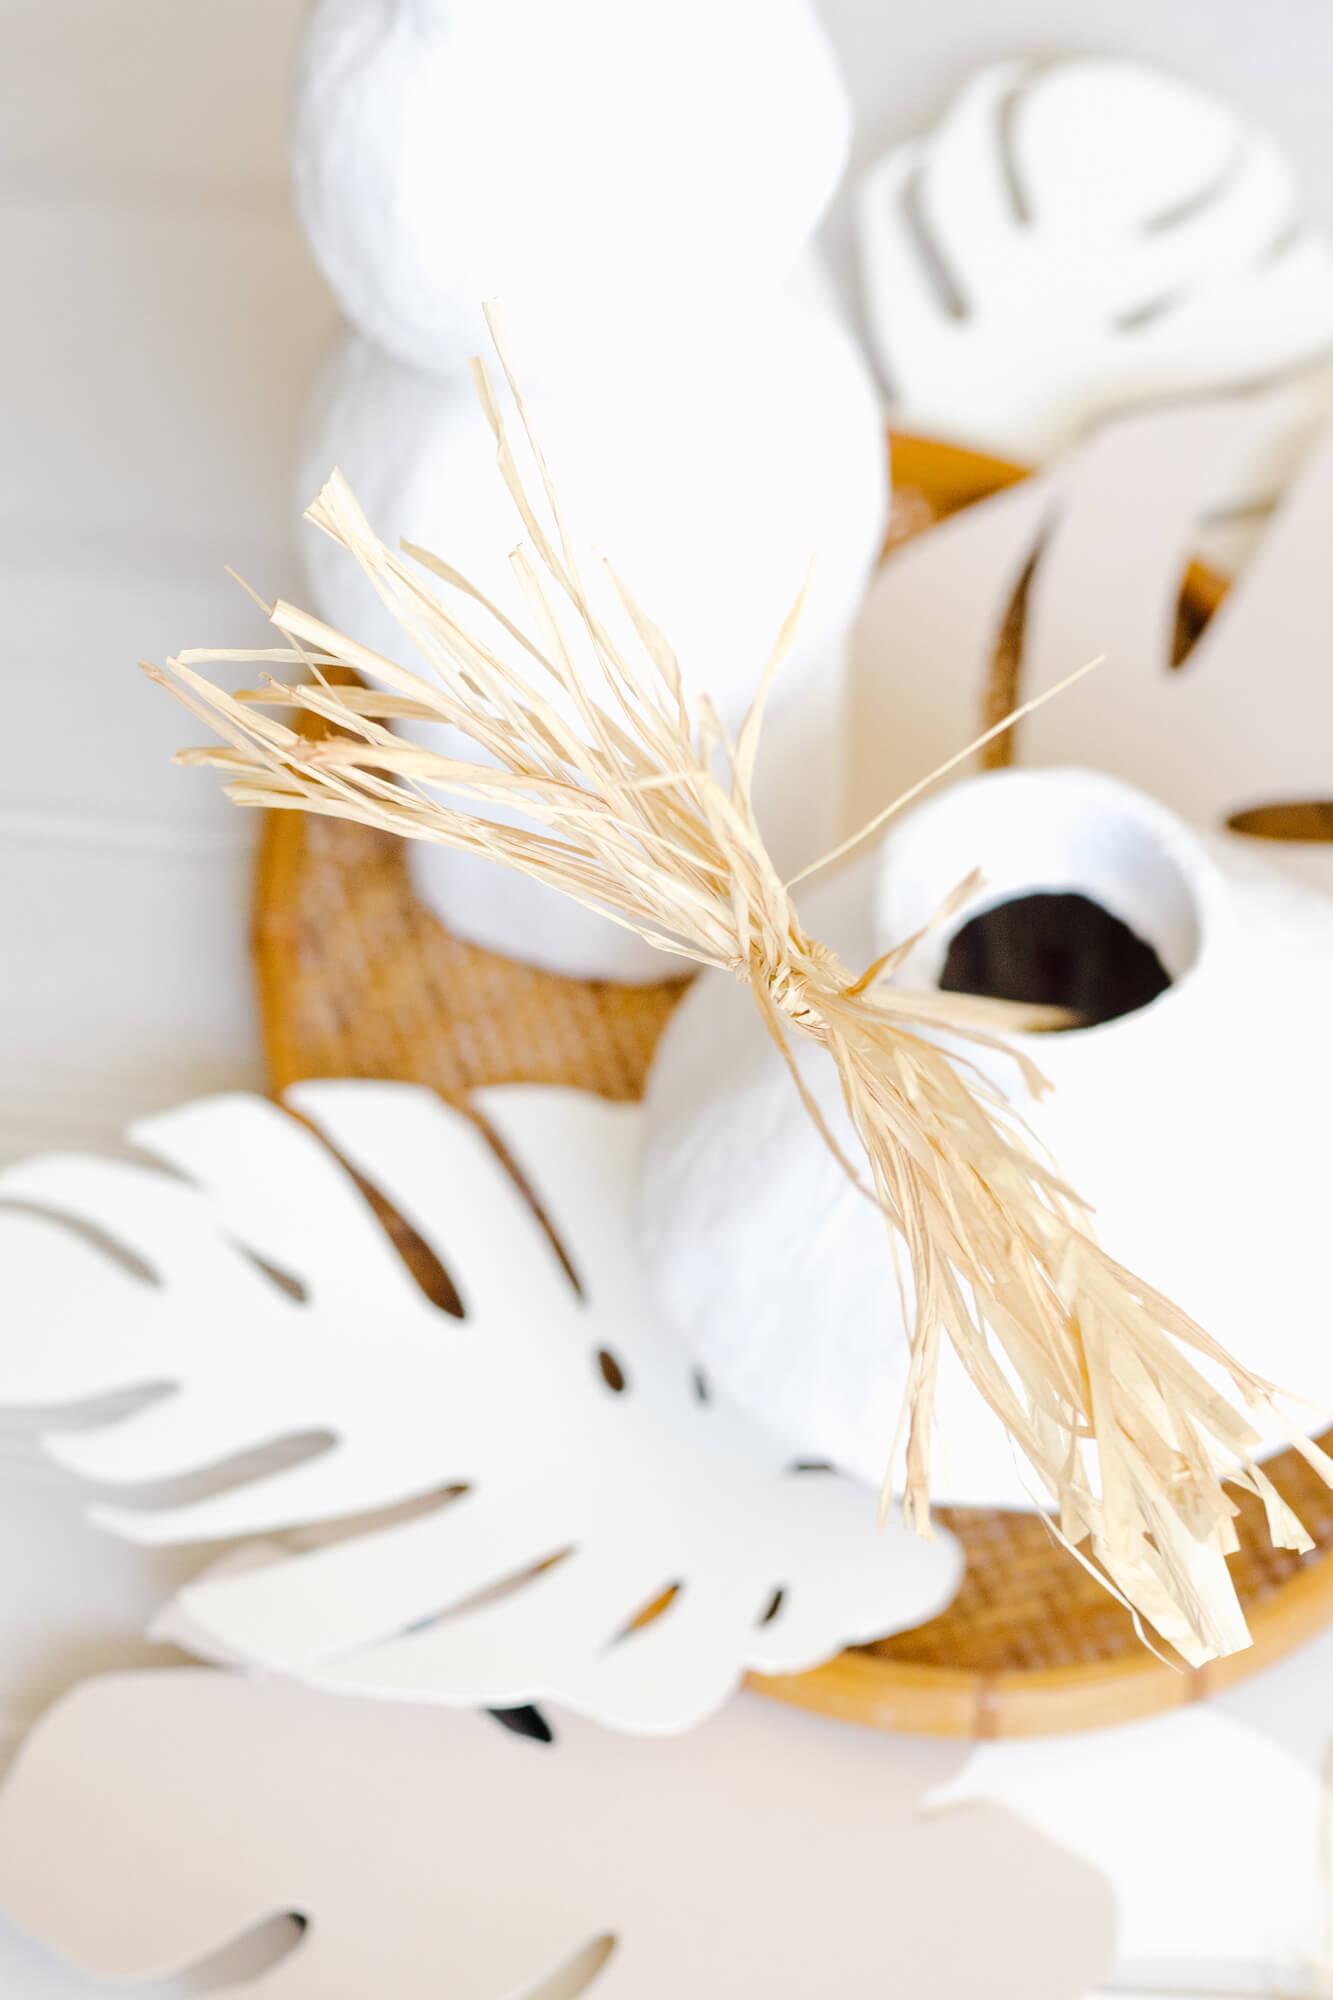 How to Make Dried Raffia Palm Fronds